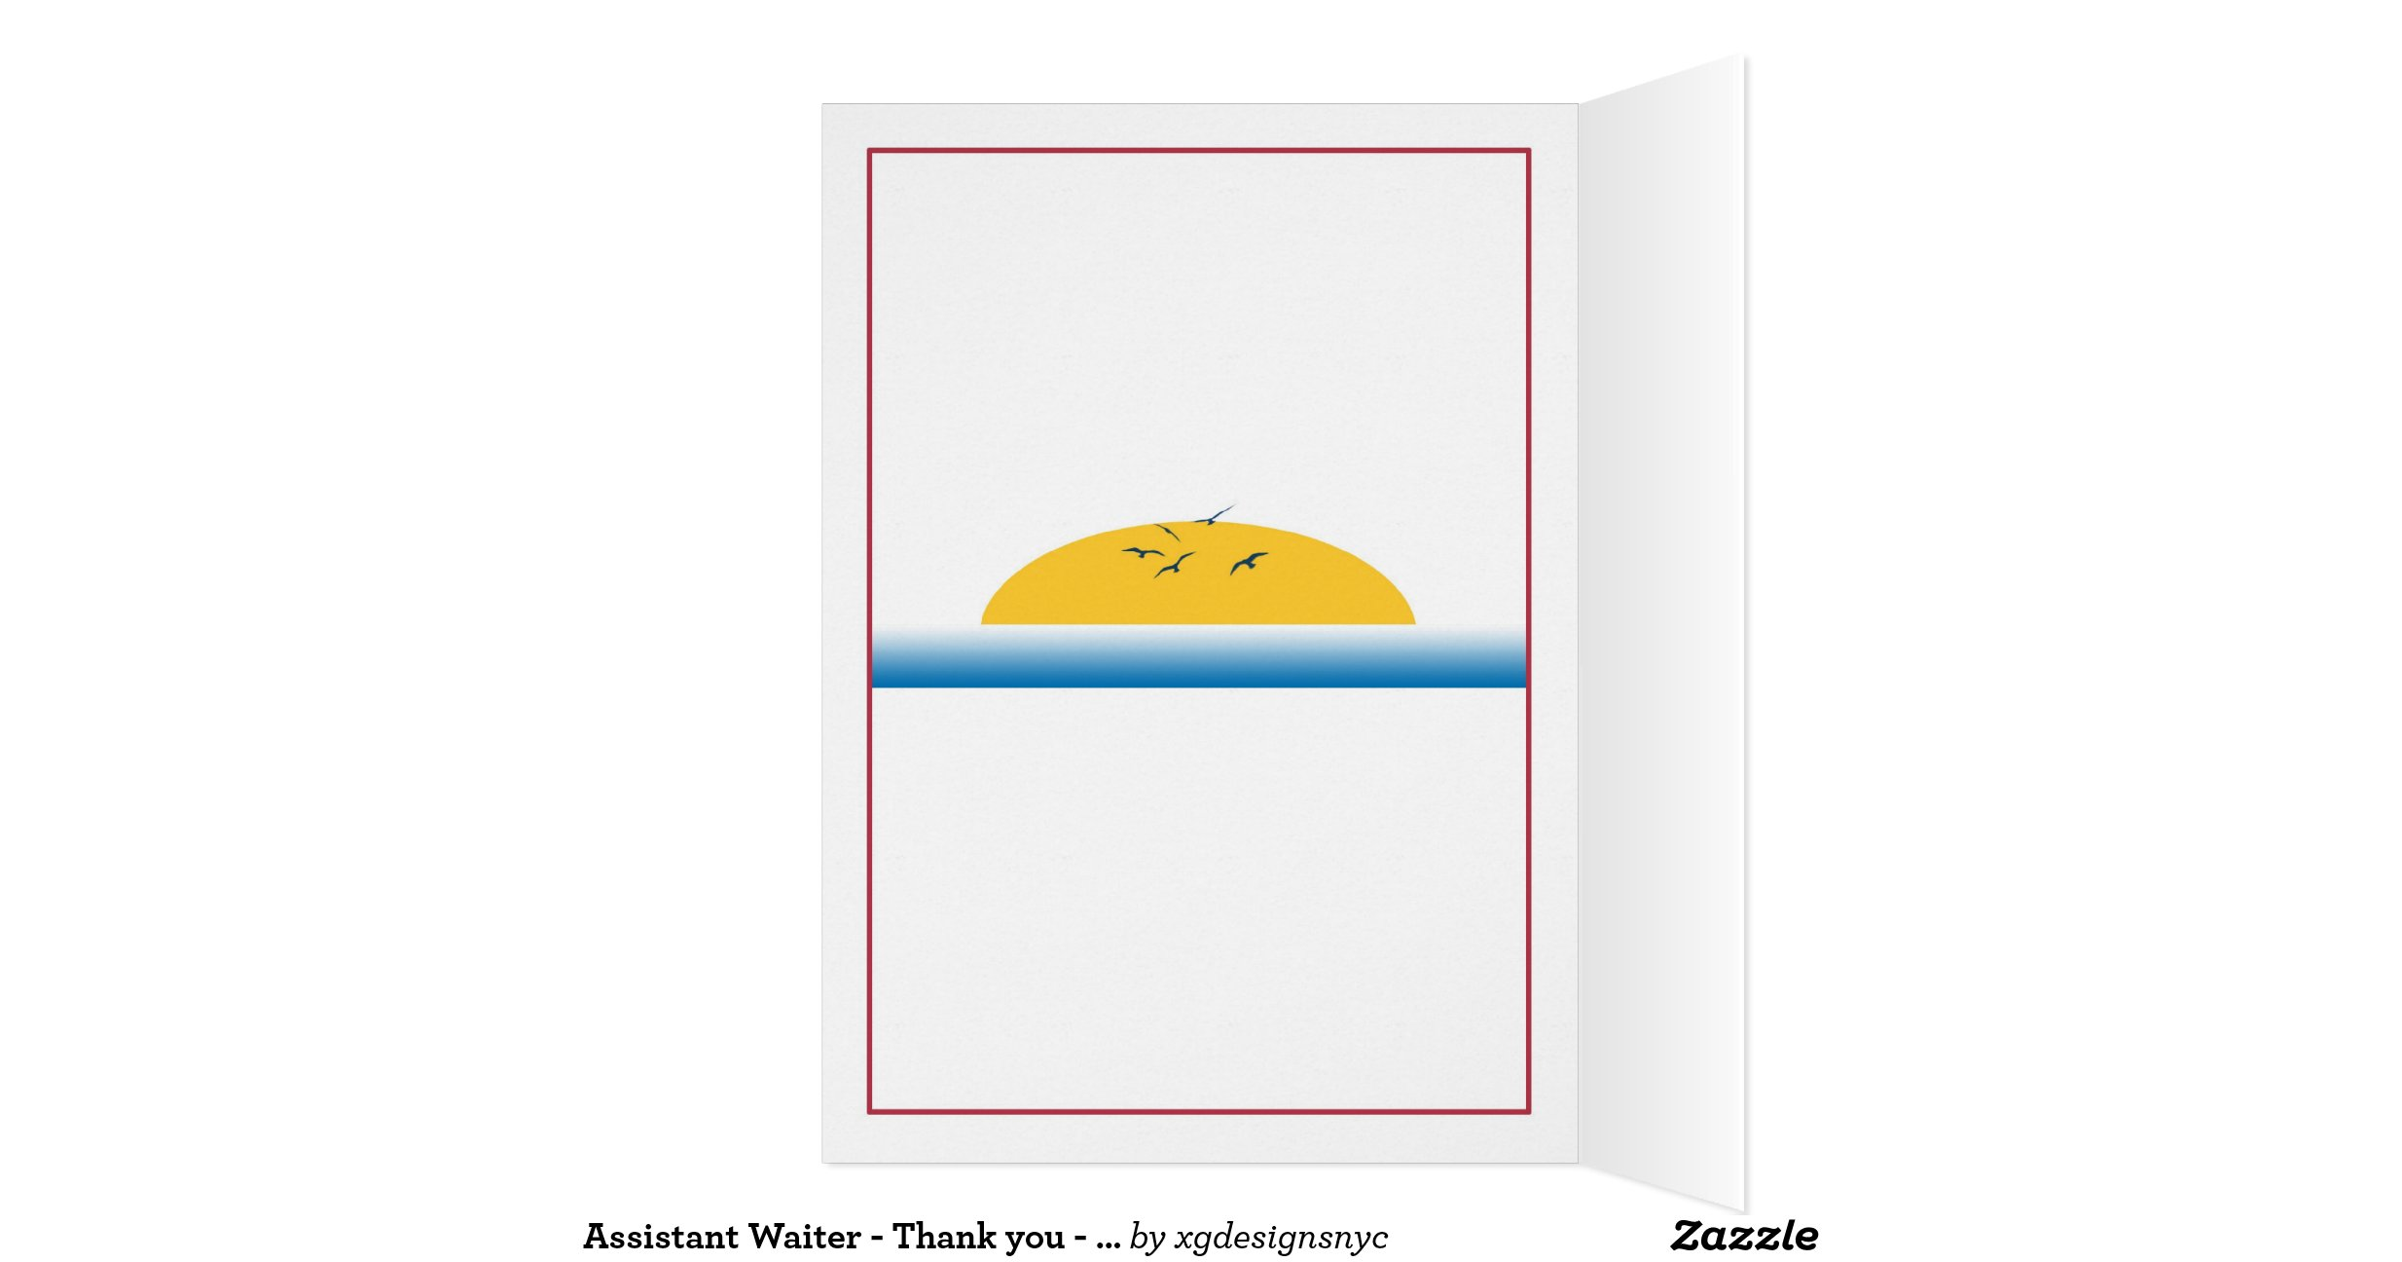 Assistant Waiter Thank You Cruise Ship Zazzle